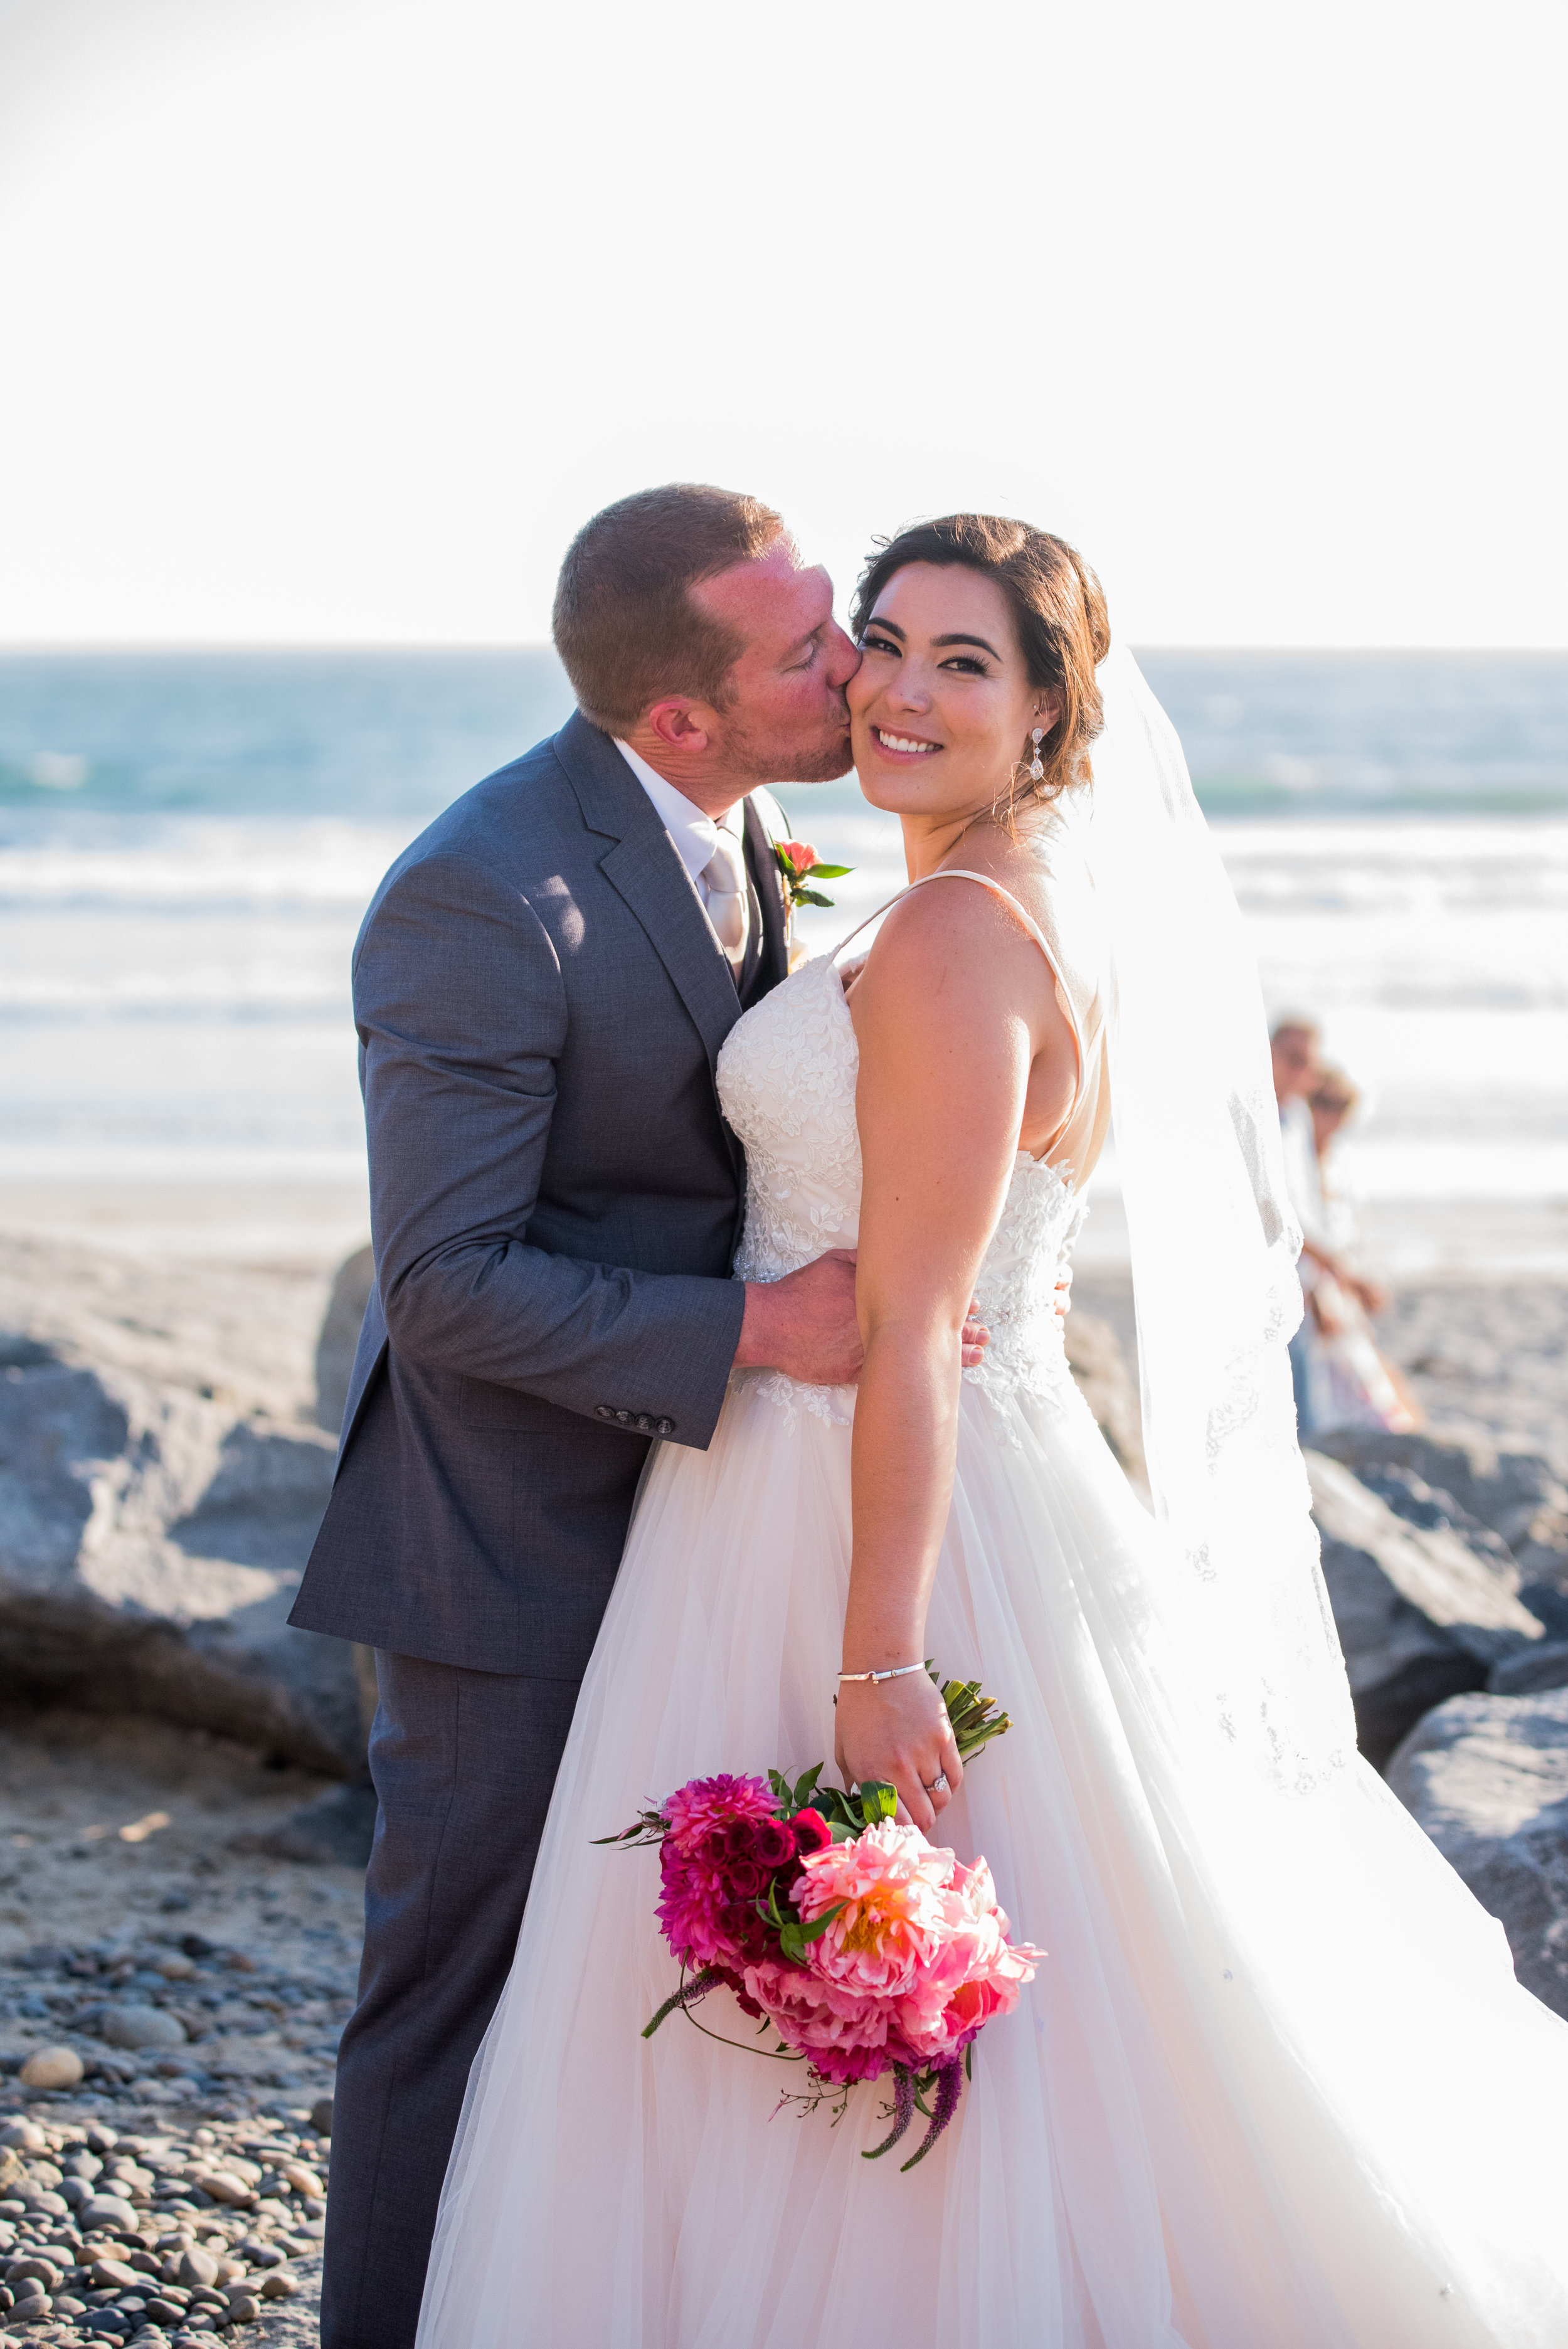 Pacific-Coast-Grill-Beach-Wedding-Olivia-Kevin-2016-447.jpg